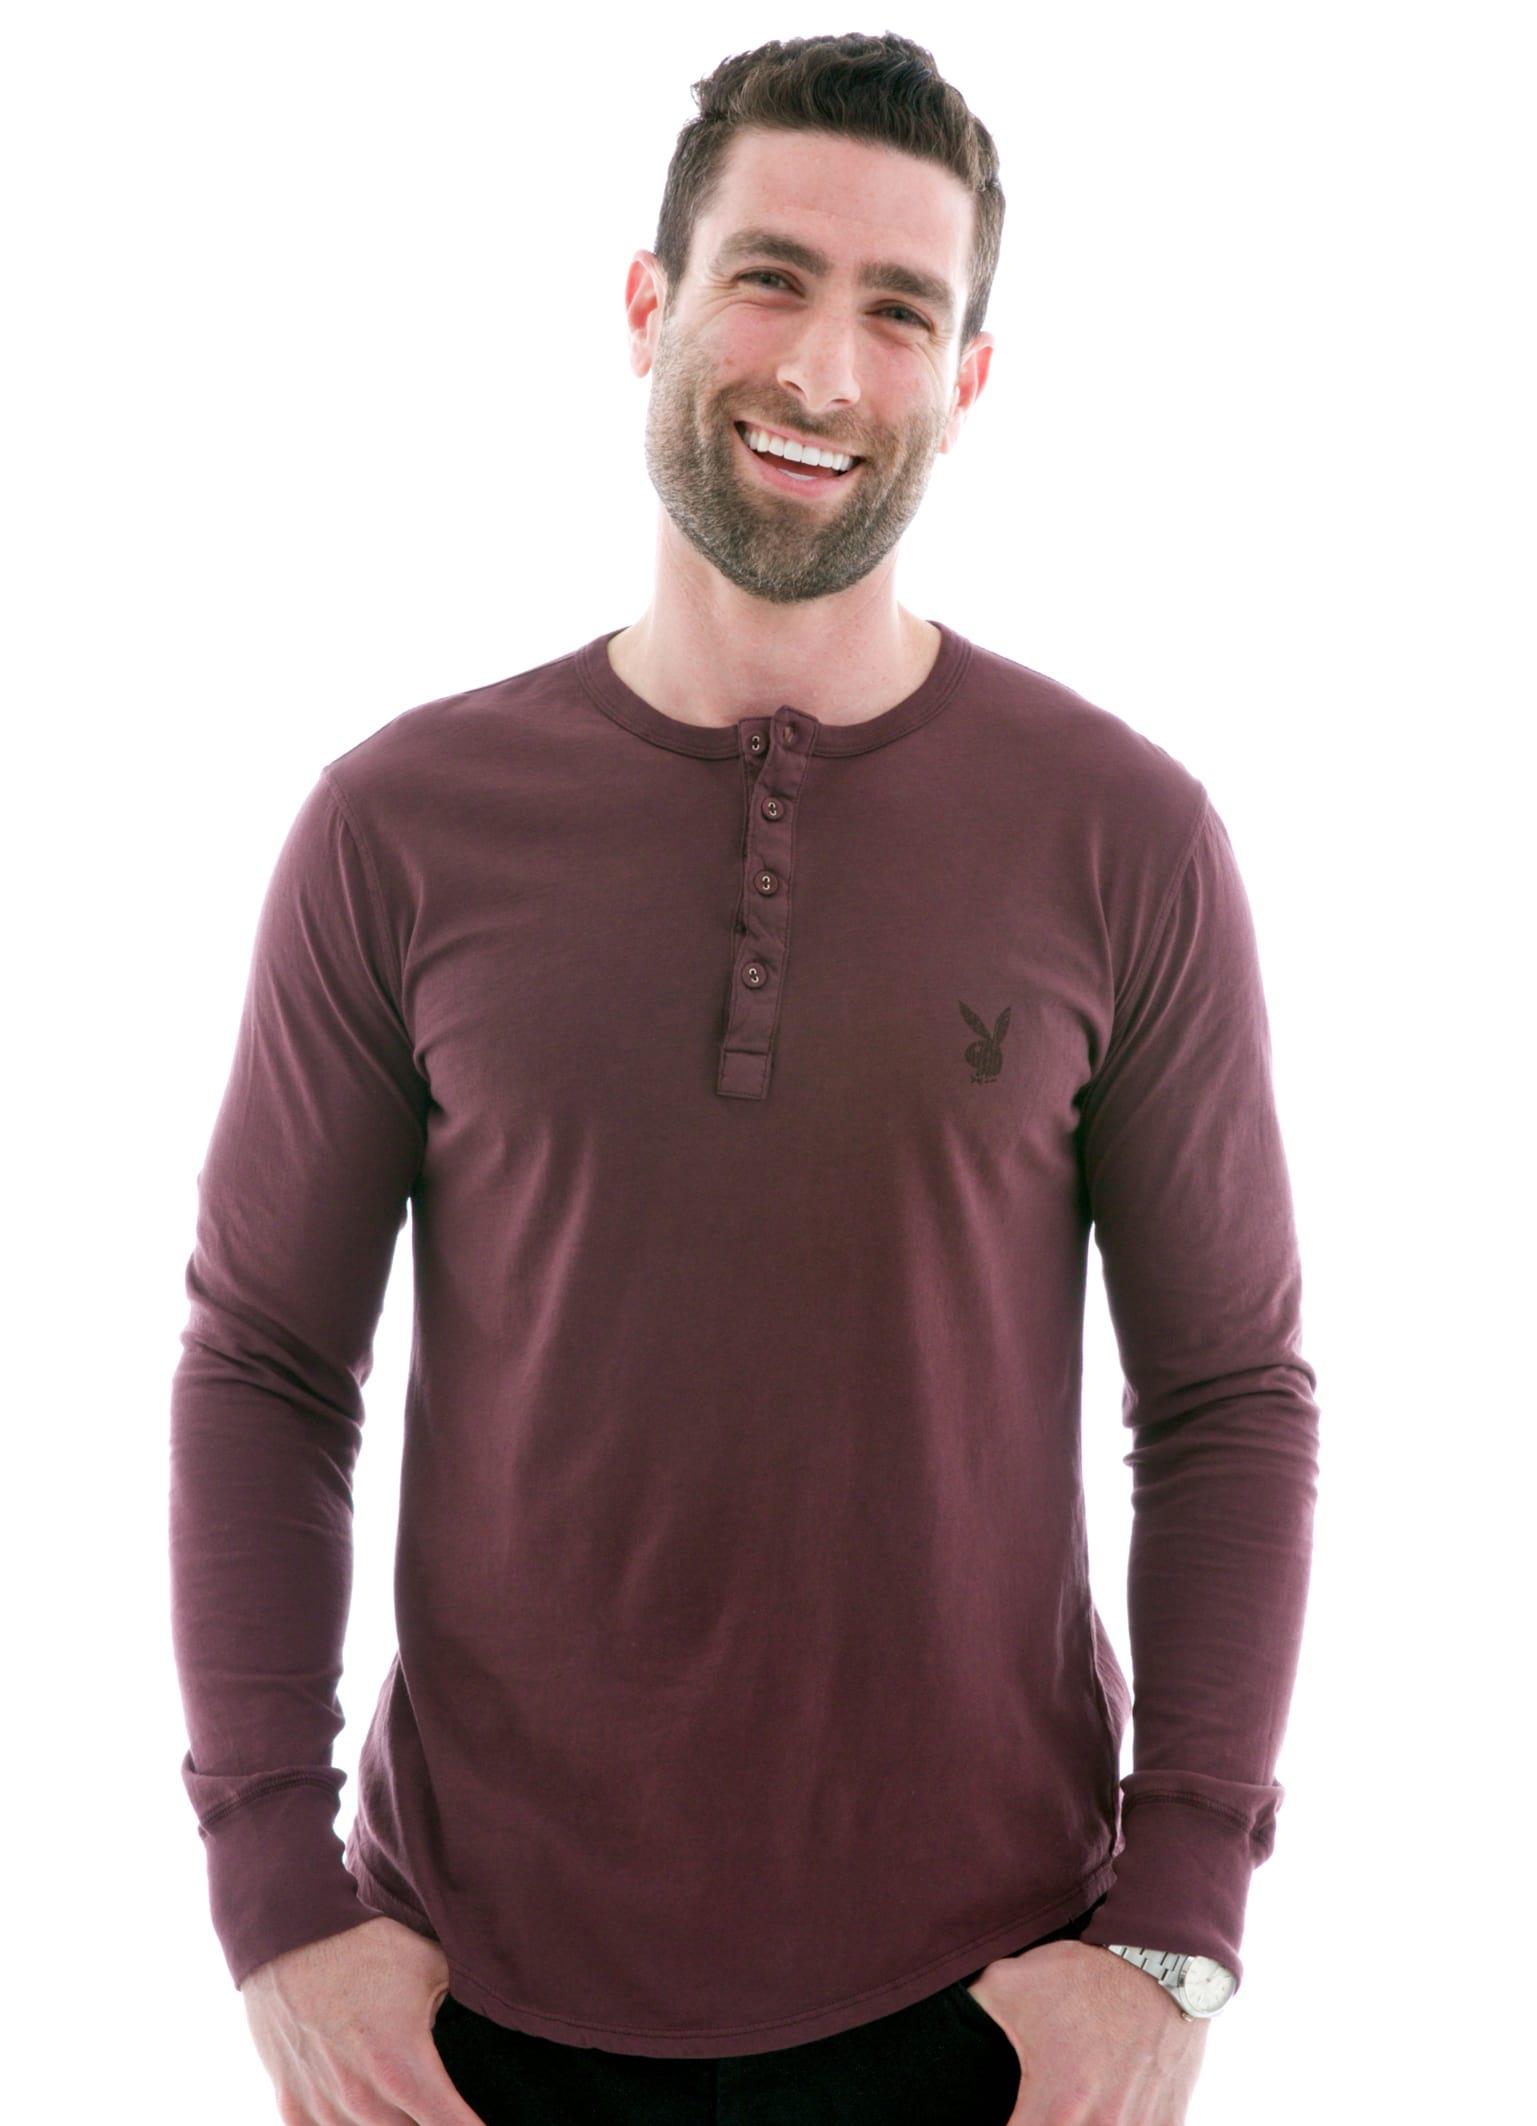 Customizable Long Sleeved Shirts